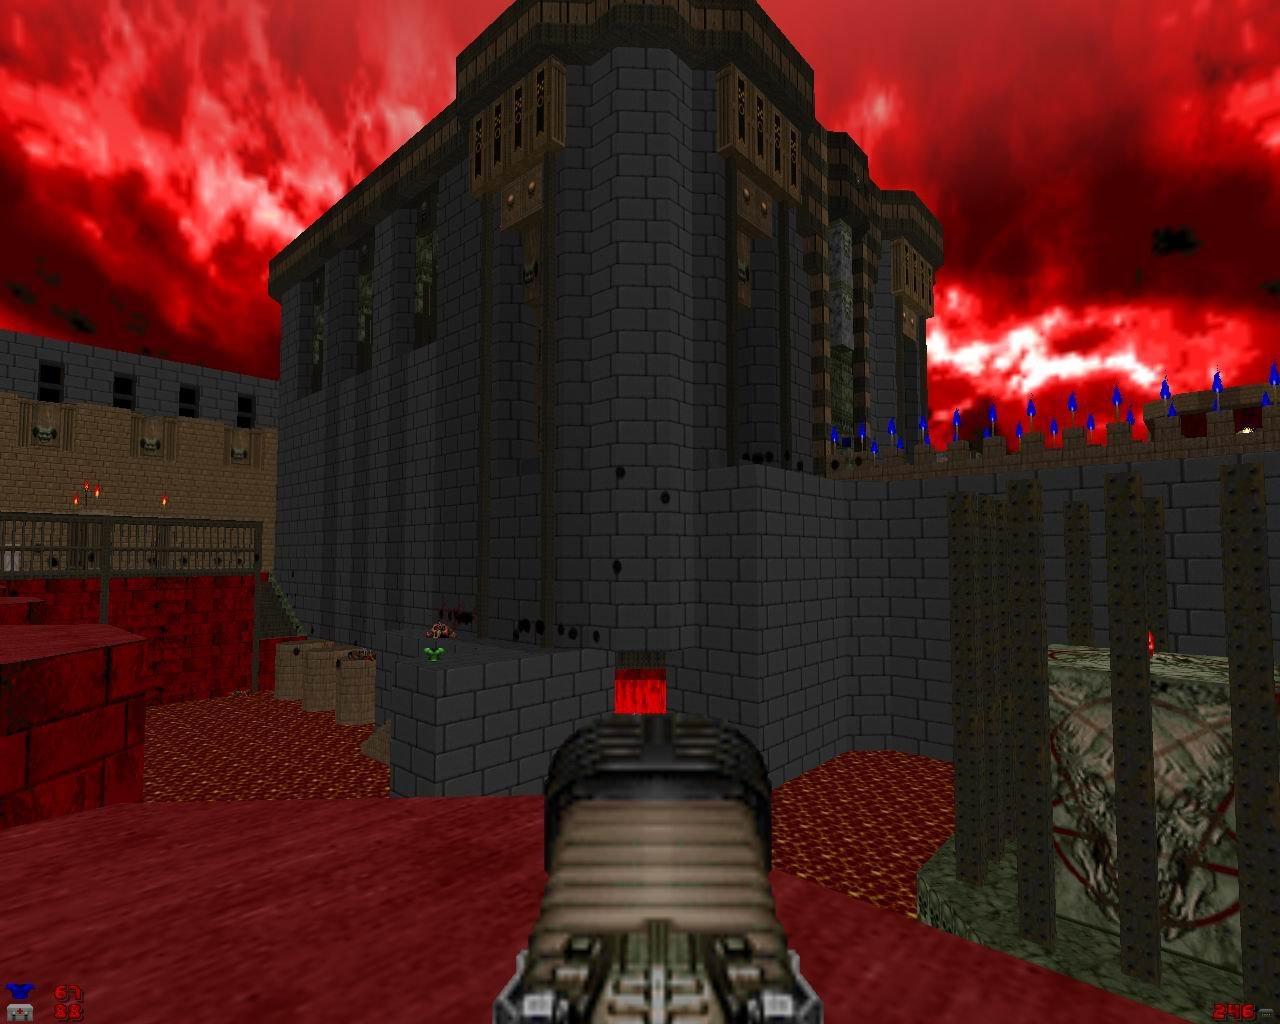 Screenshot_Doom_20210103_195425.jpg.4d6542b5b5c2a49a673d8f147fbb62be.jpg